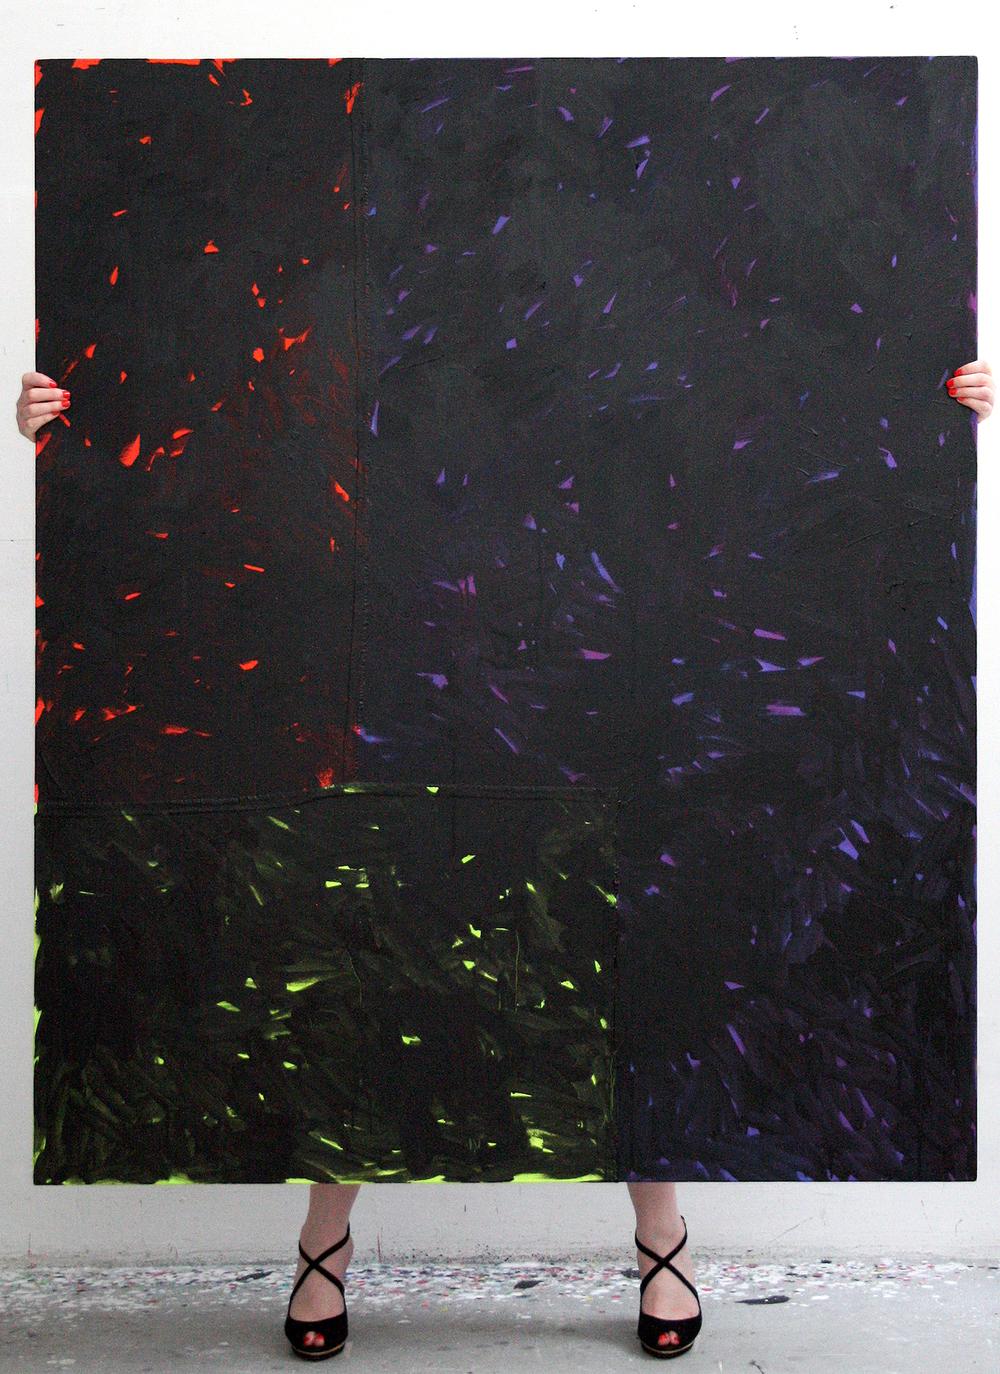 'Acid Blush' exhibit invite, Christian Larsen Gallery, Stockholm, Sweden, 2013